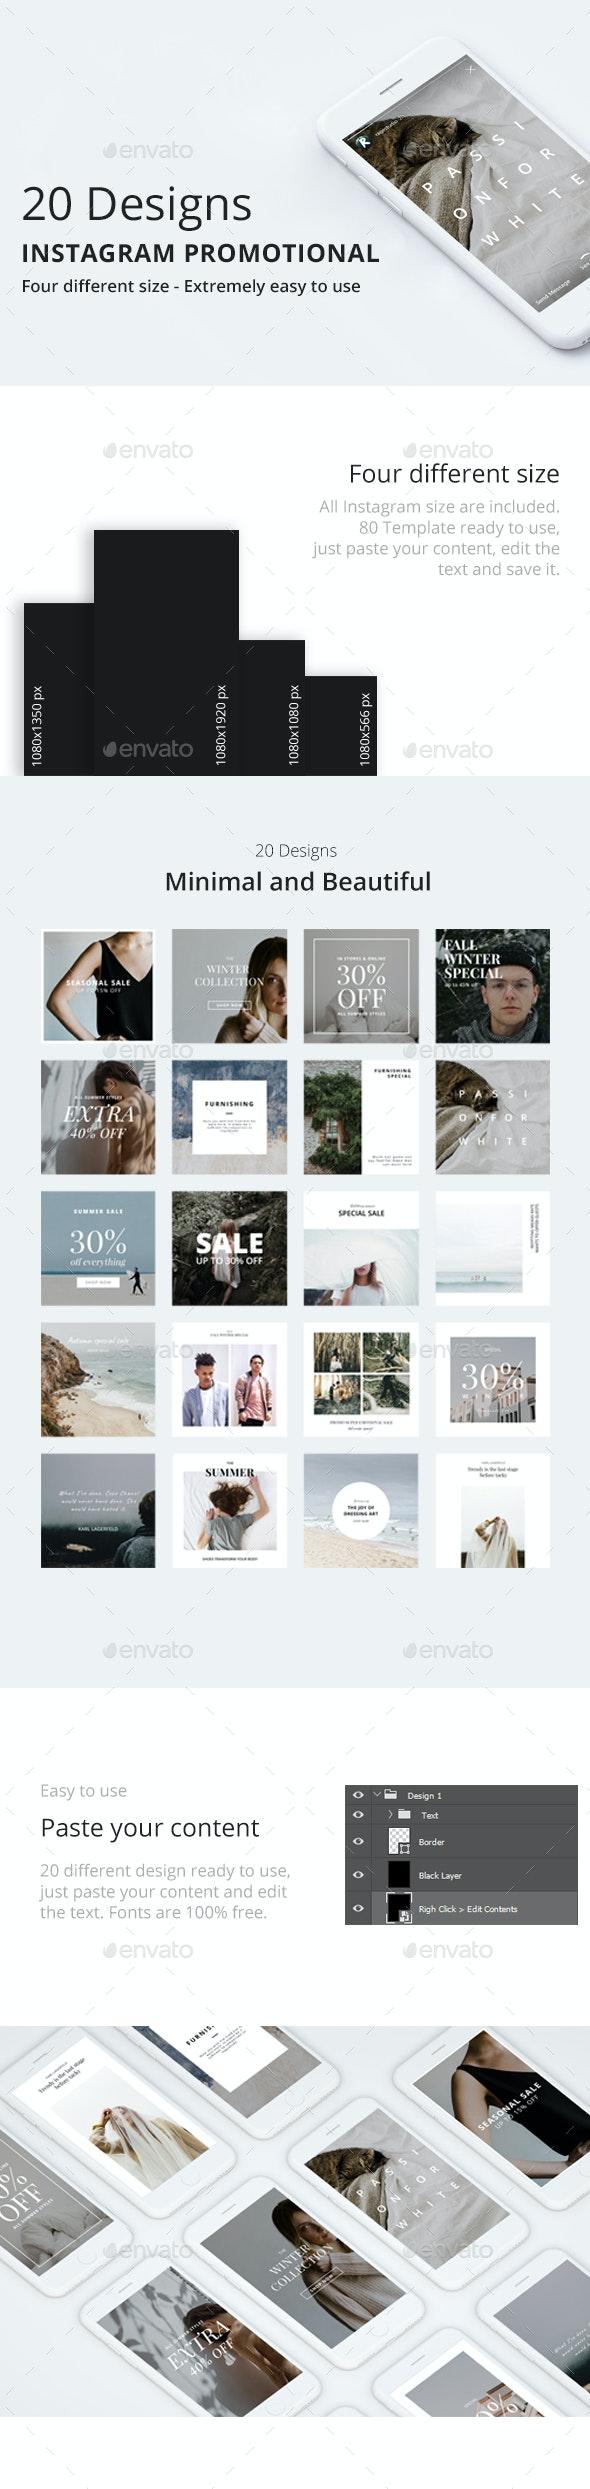 20 Instagram Promotional Template - Social Media Web Elements